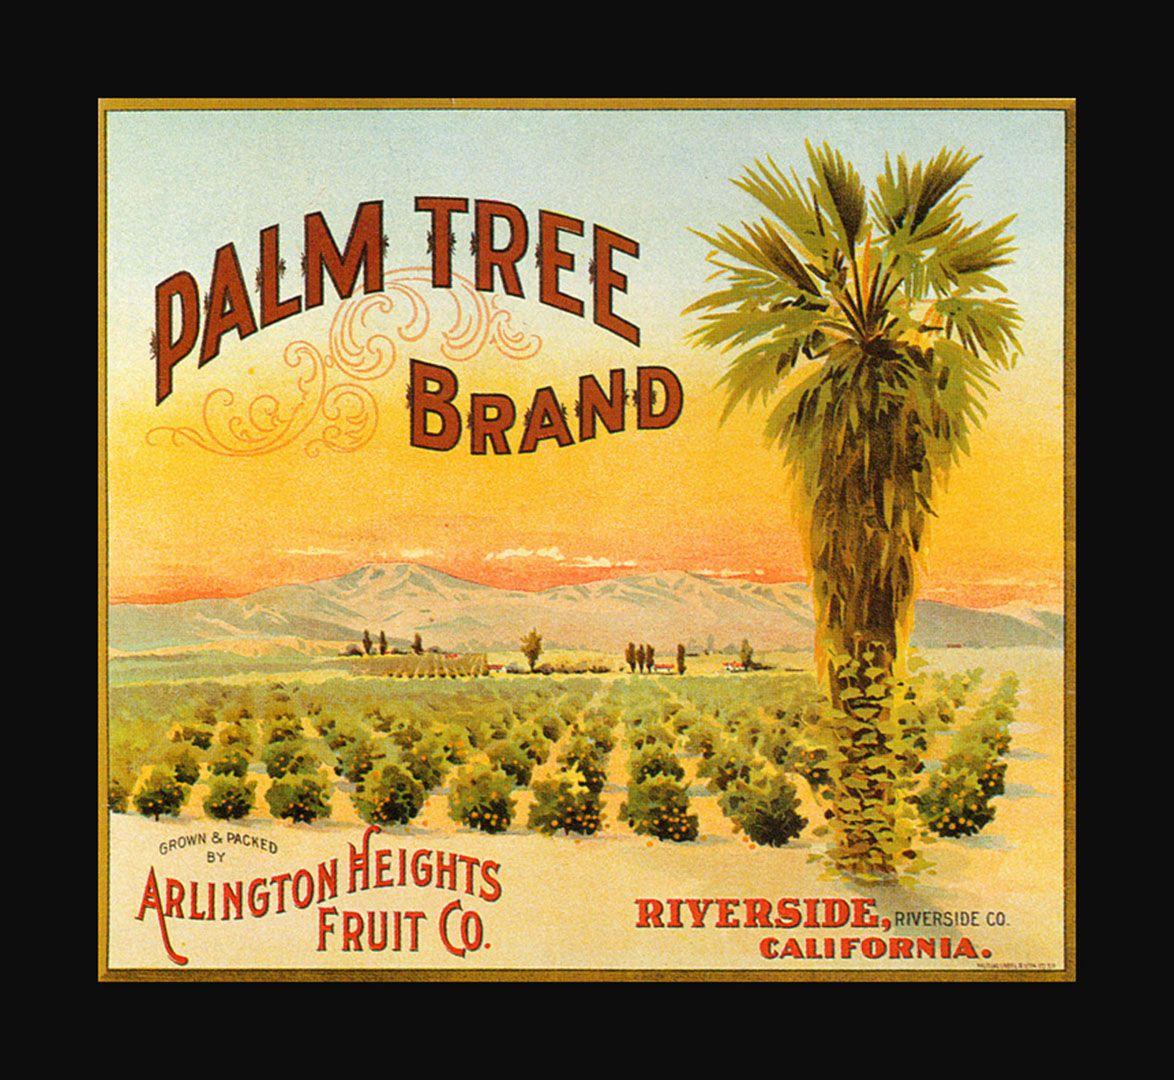 Palm Tree Brand Oranges